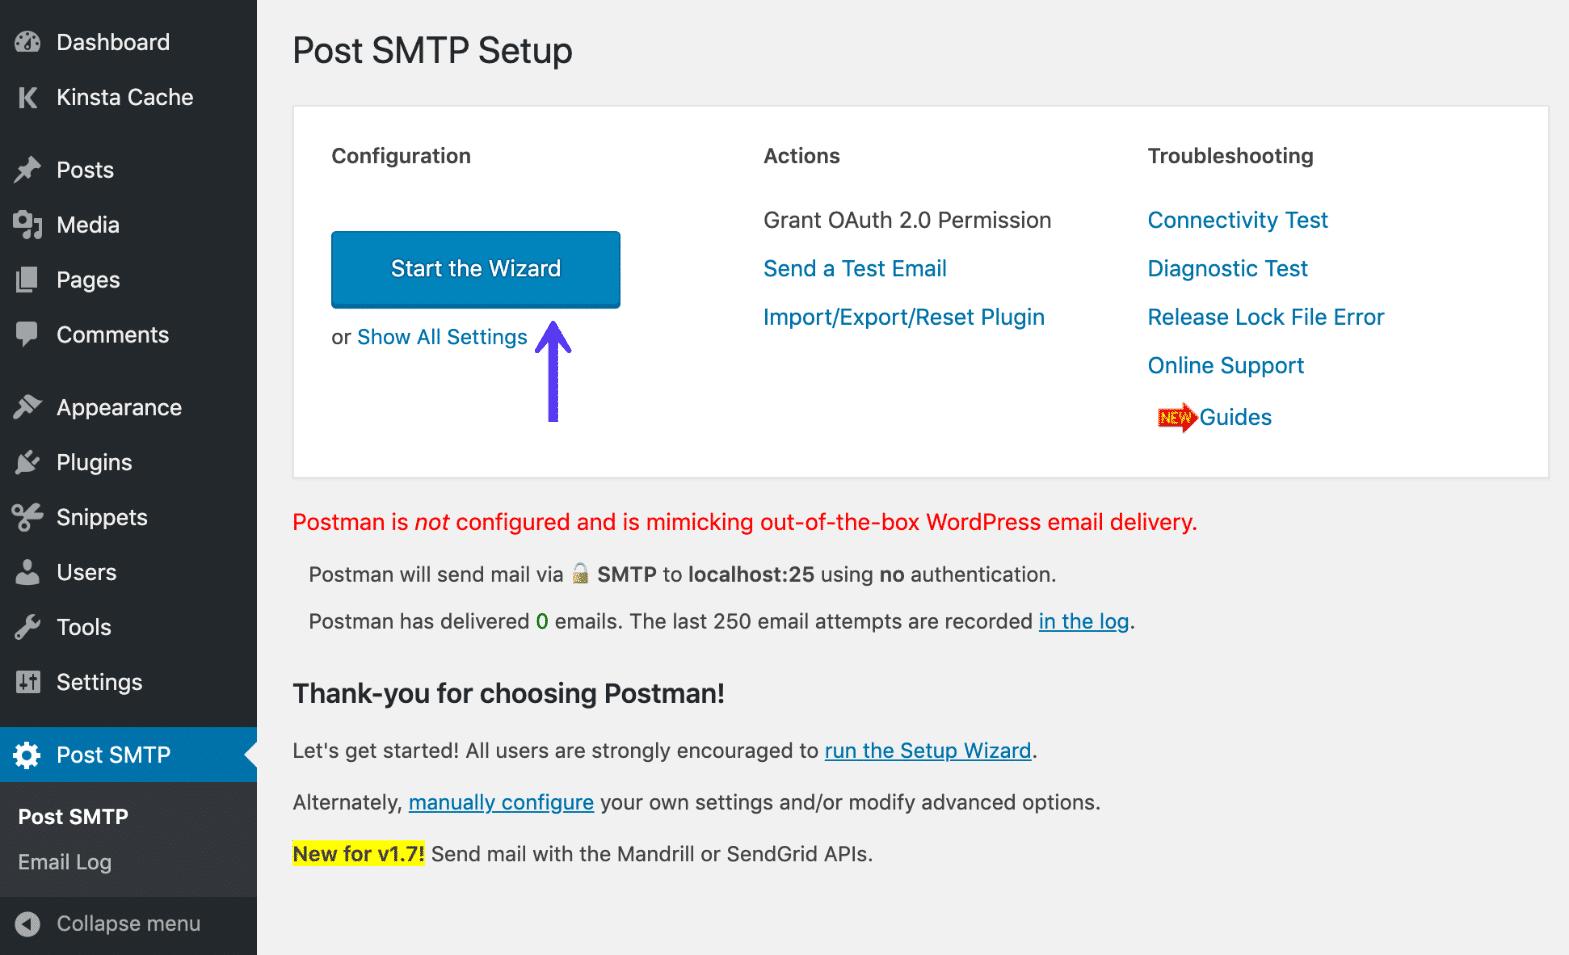 Asistente de publicación SMTP